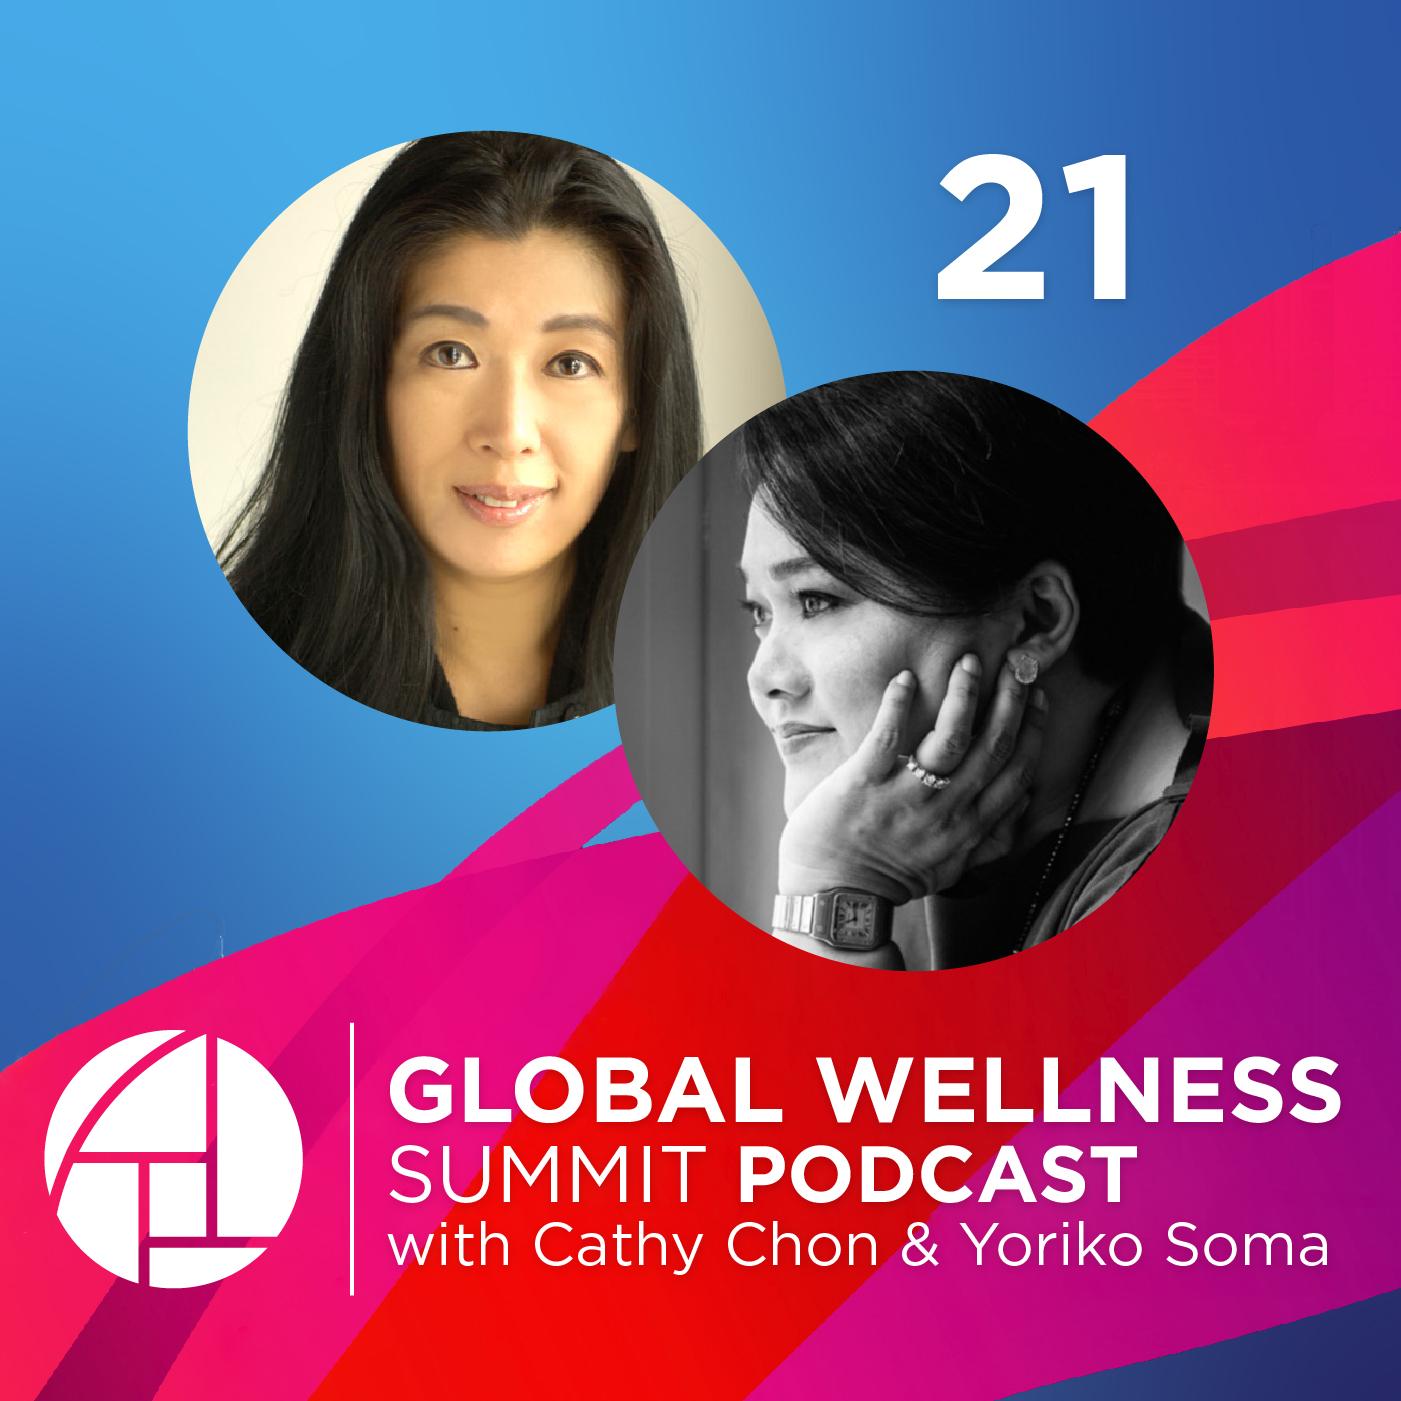 21. Embracing The Asian Century Worldwide - with Cathy Chon & Yoriko Soma